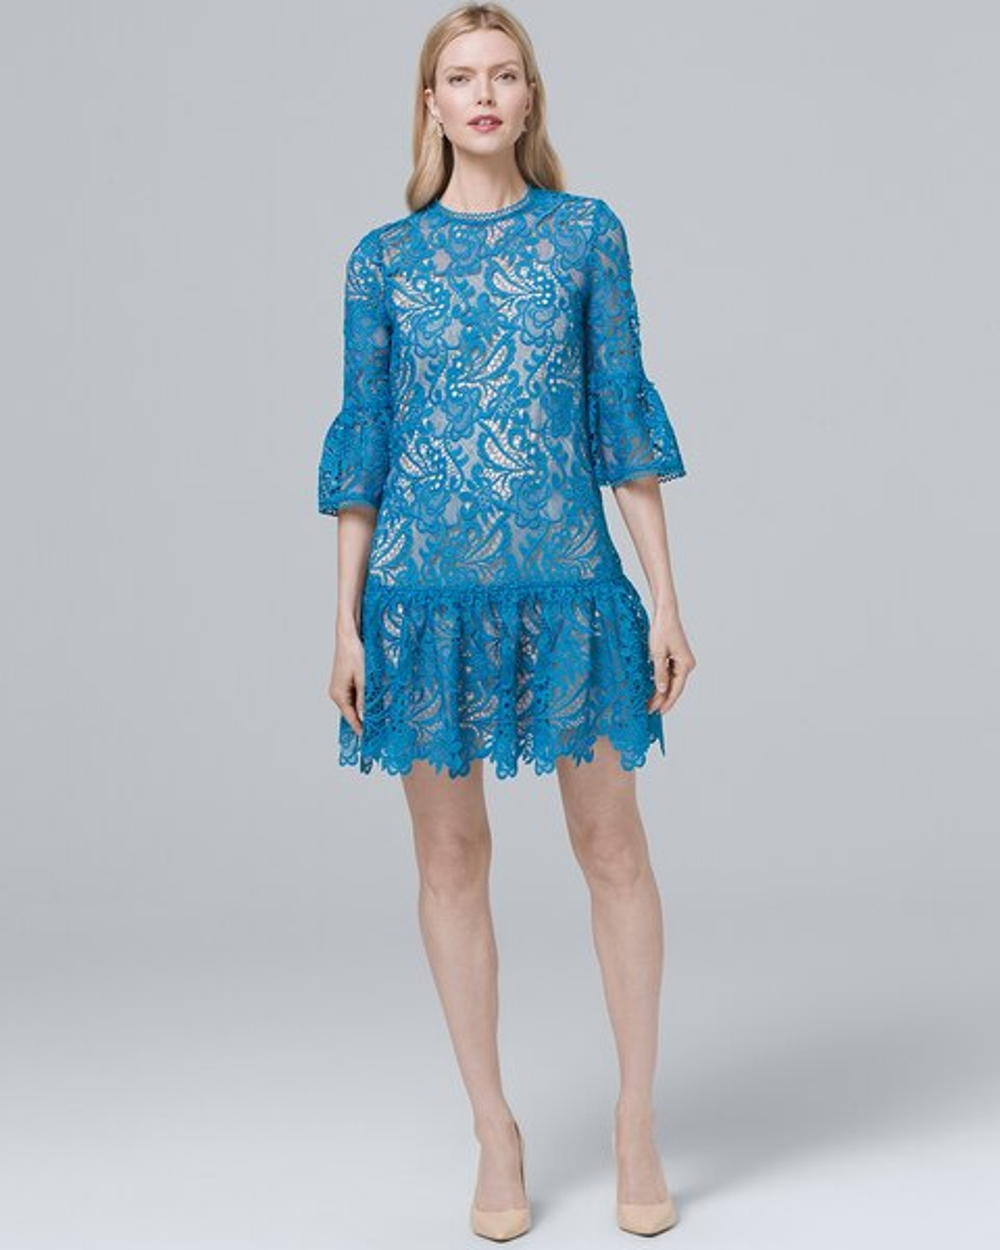 Dropped Waist Lace Shift Dress White House Black Market